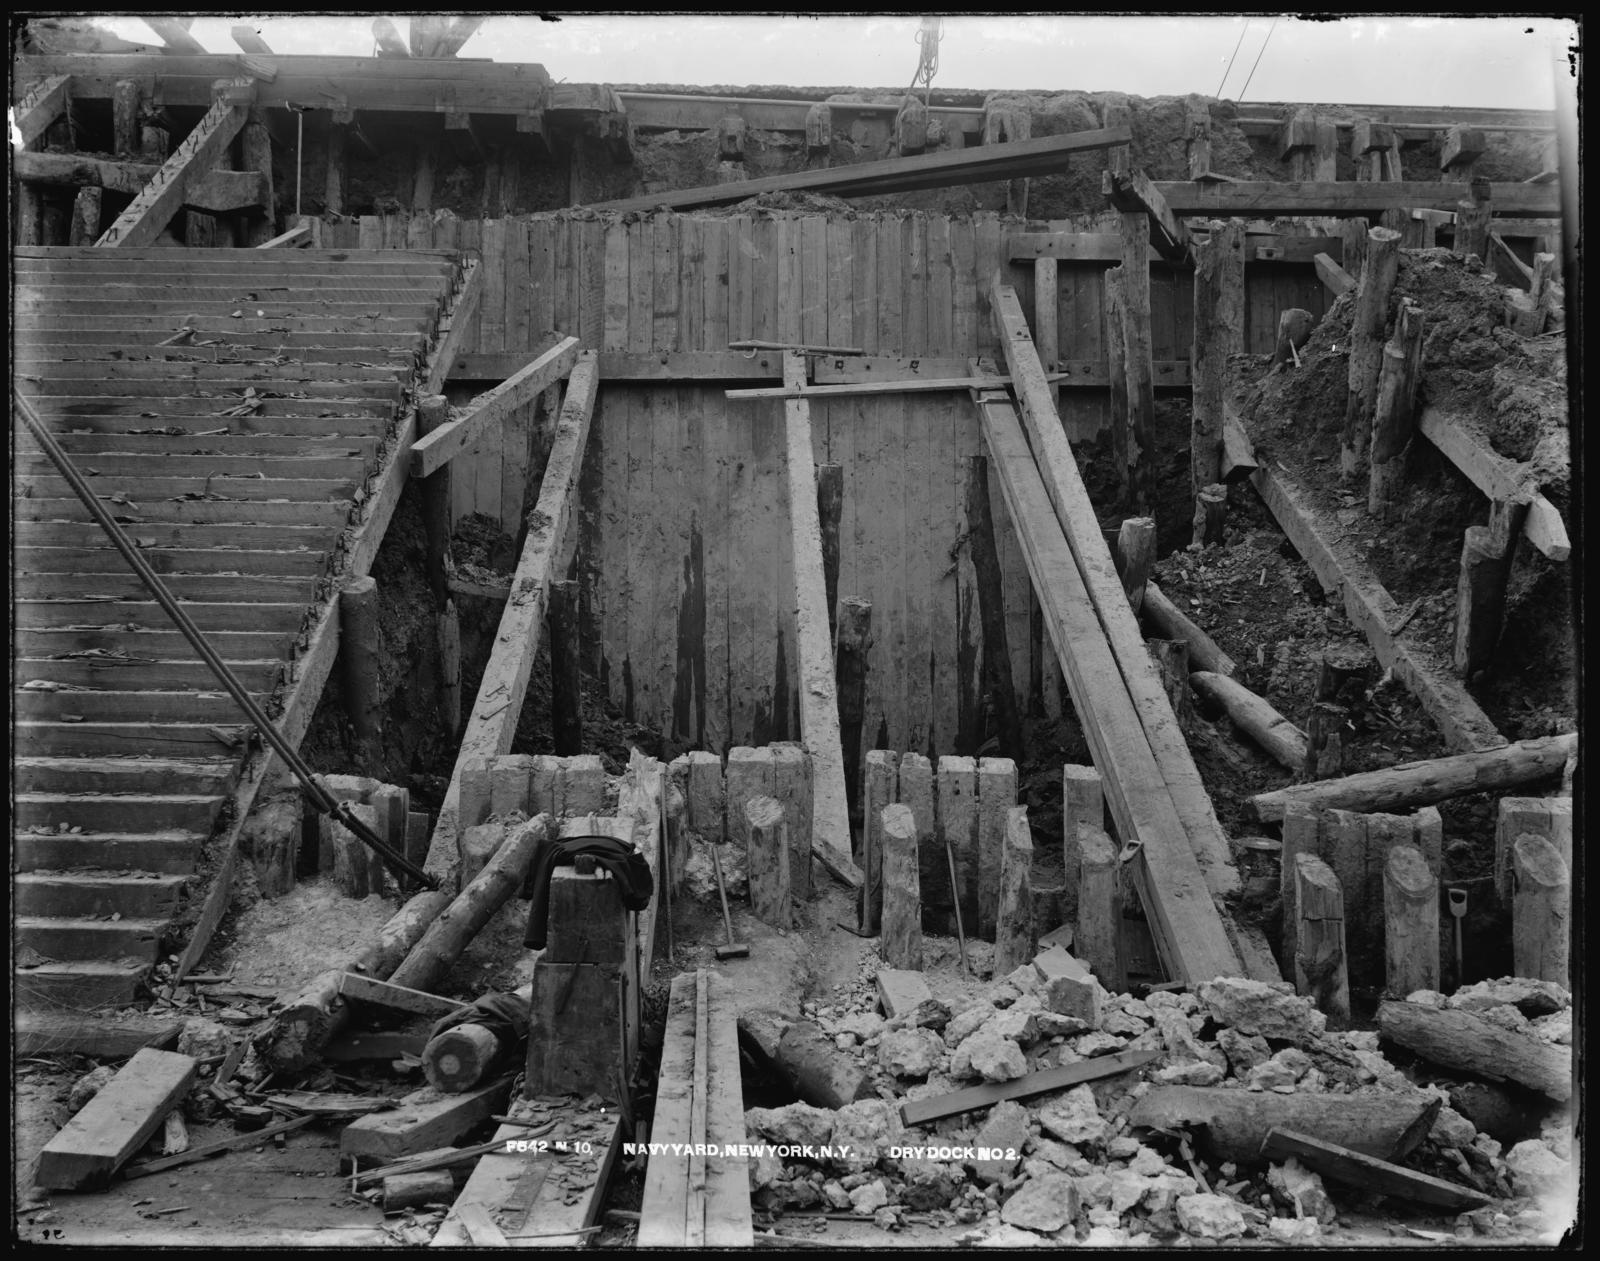 Dry Dock Number 2